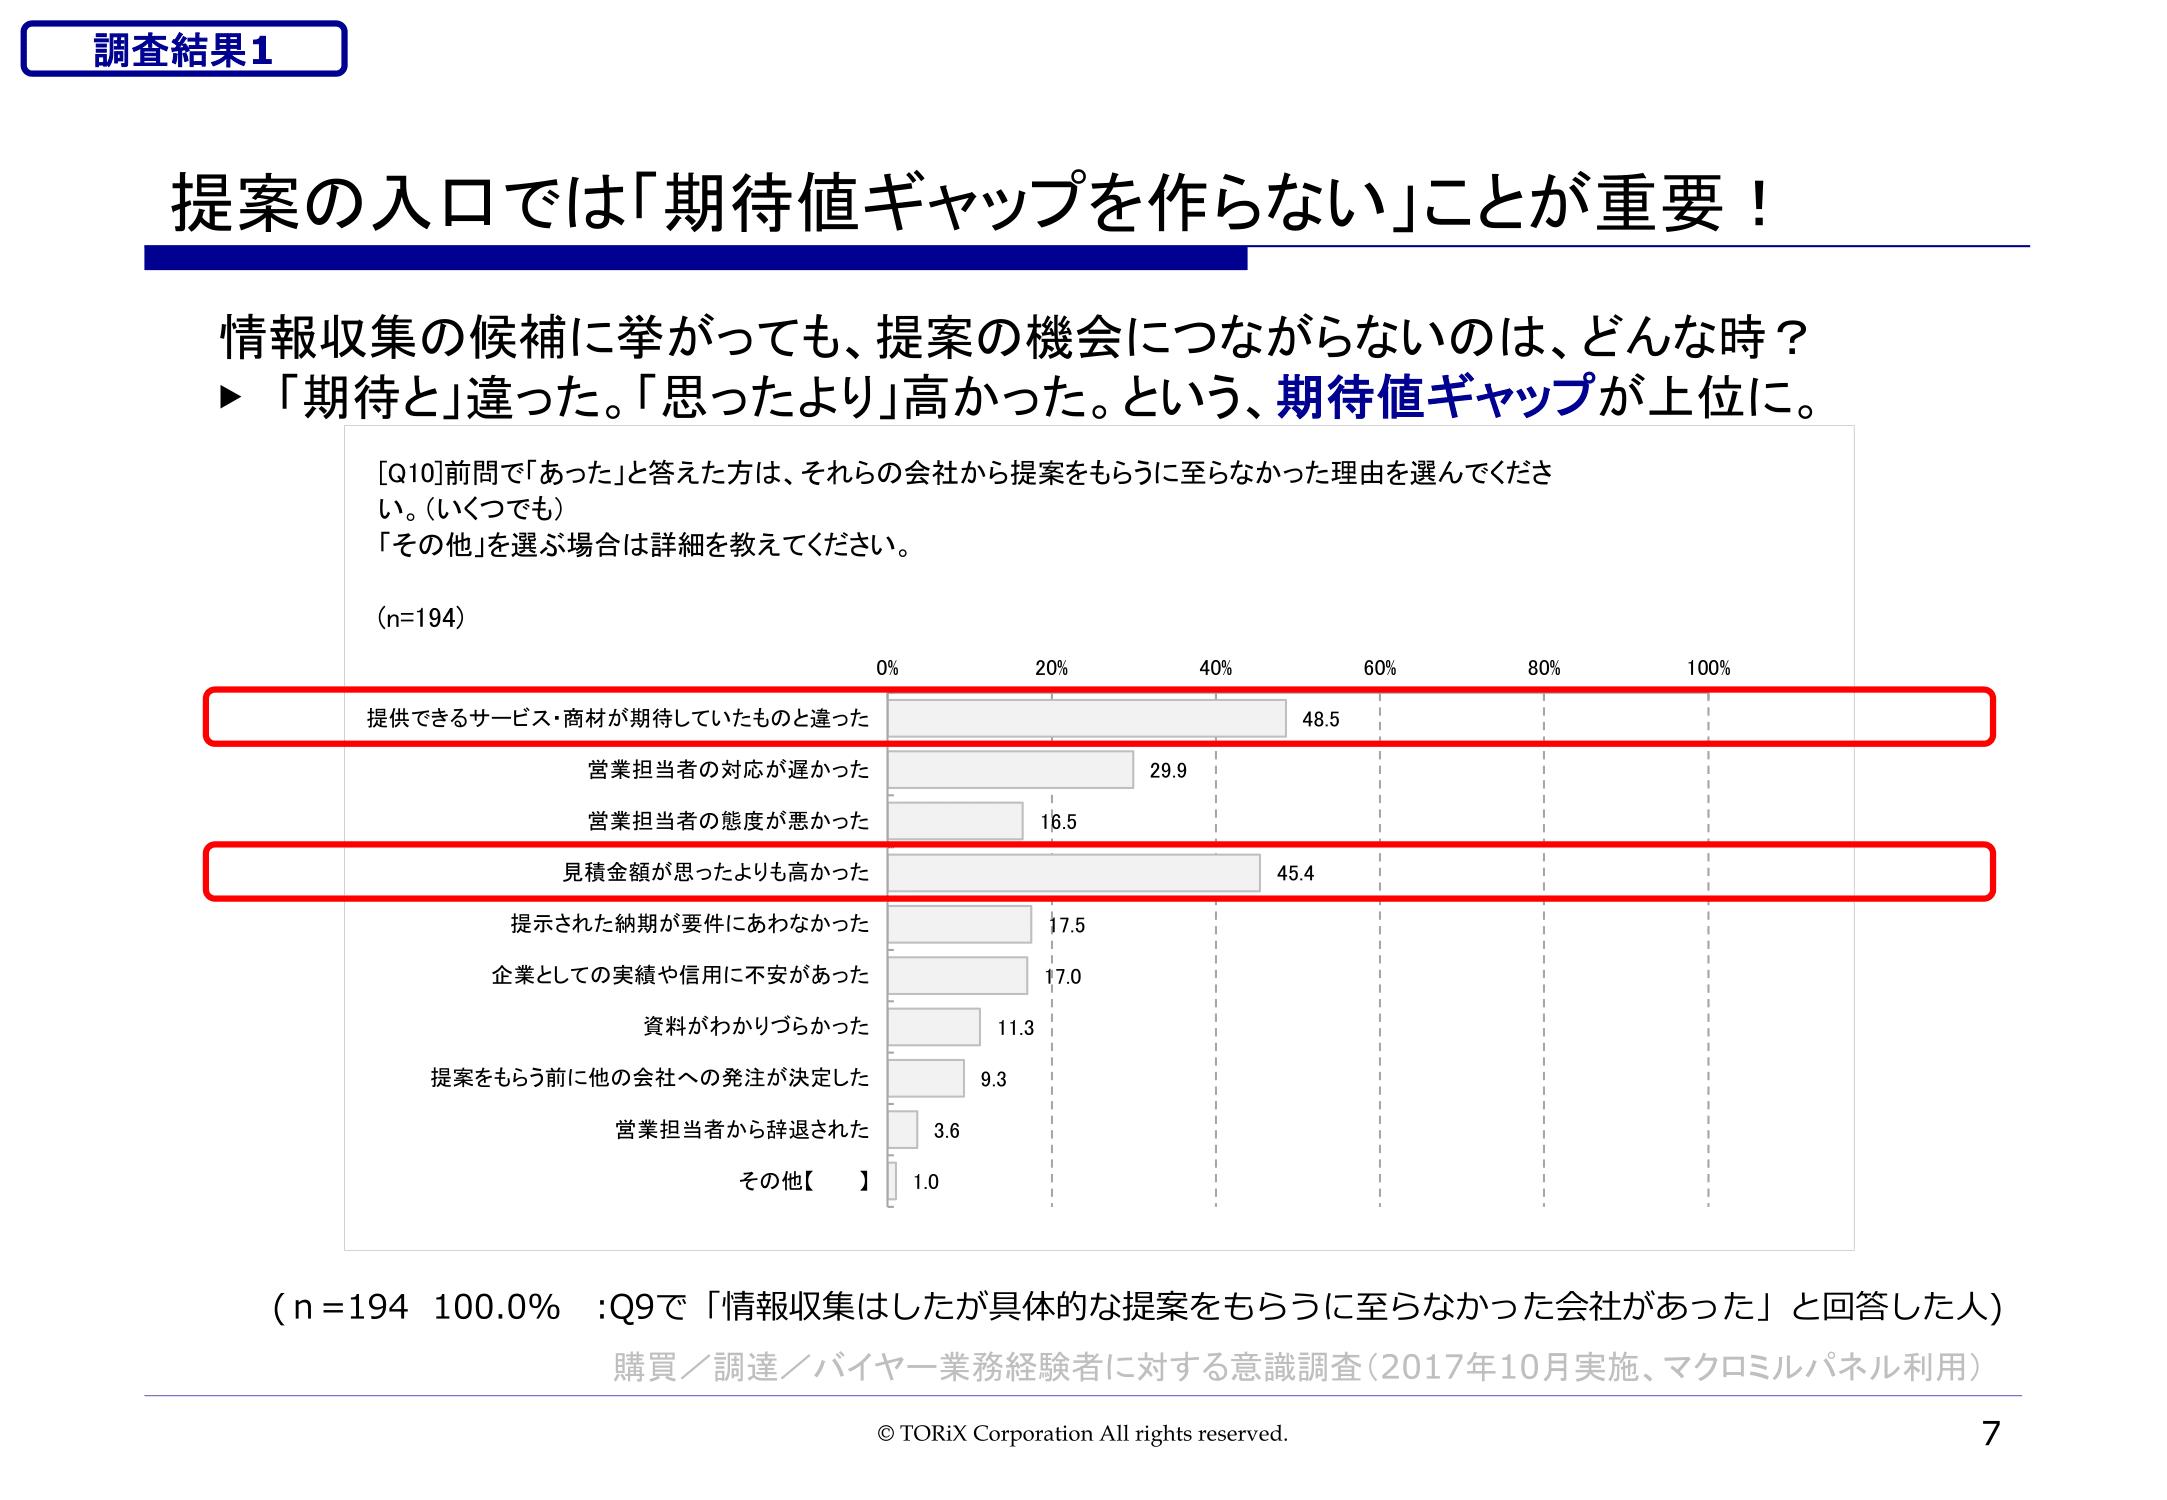 "180912_(TORiX)""選ばれ続ける営業""に関する調査レポート-07.png"